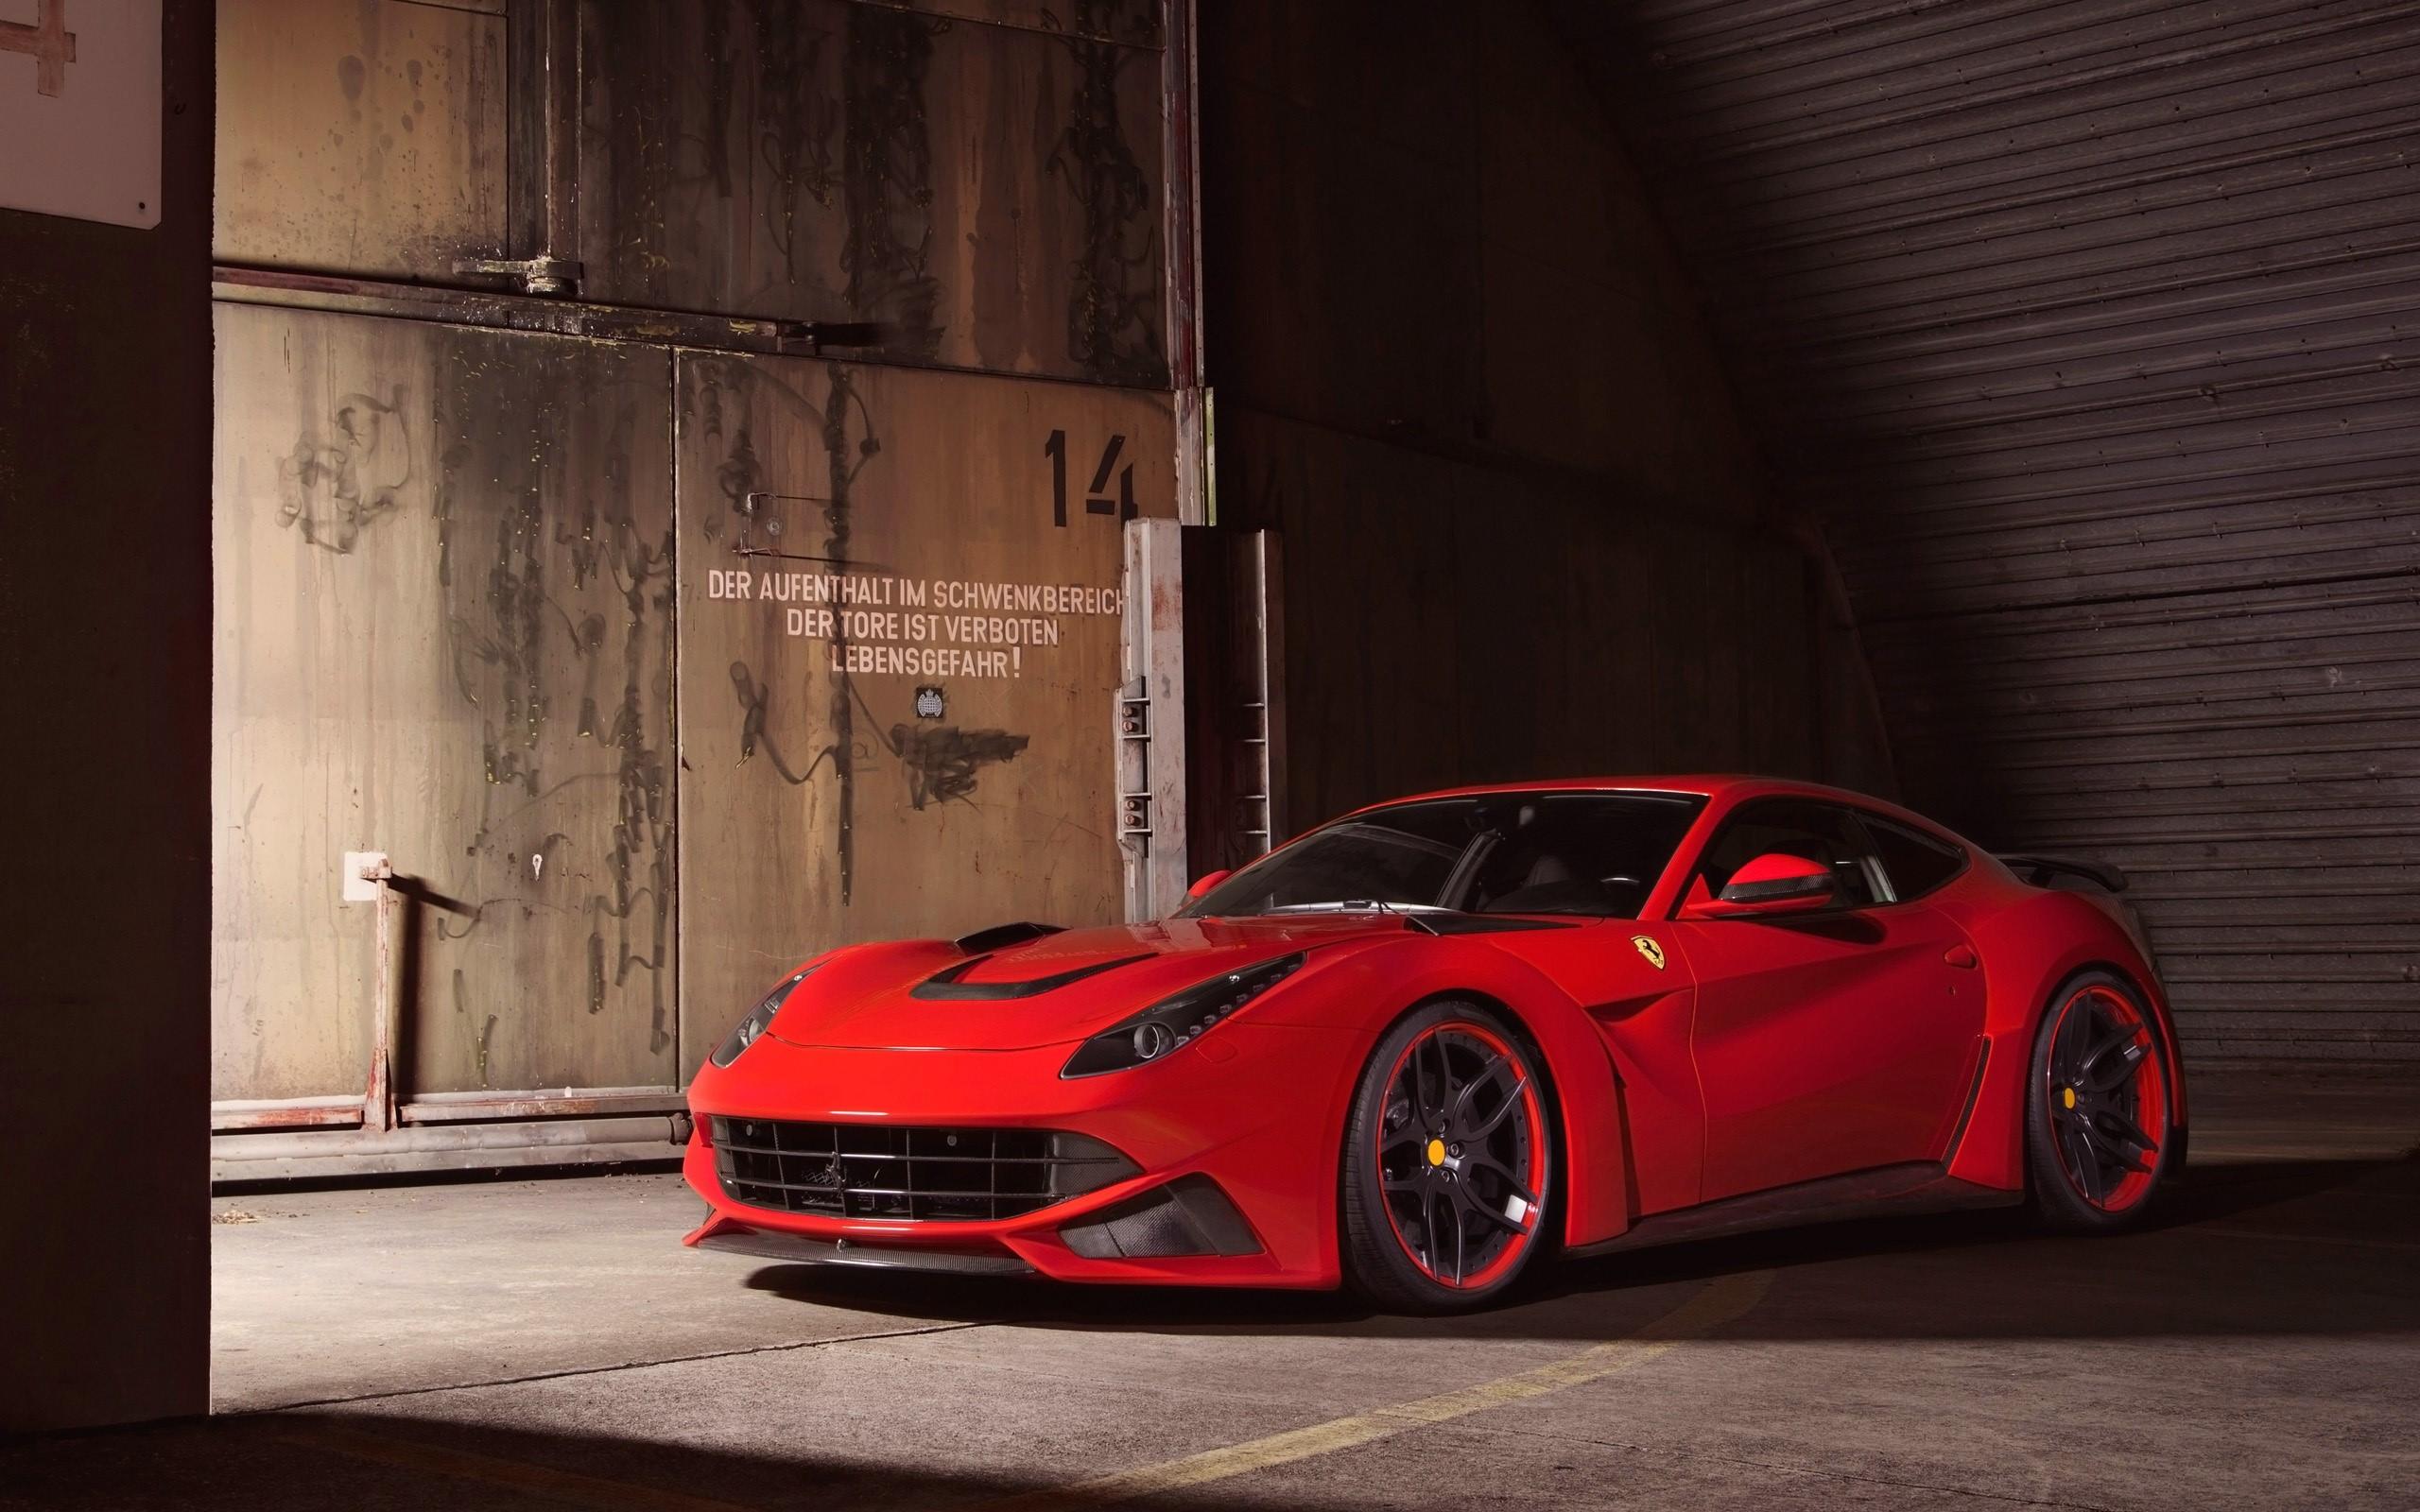 Ferrari F12 Berlinetta Novitec Rosso N Largo Wallpaper 2k Quad HD 2560x1600